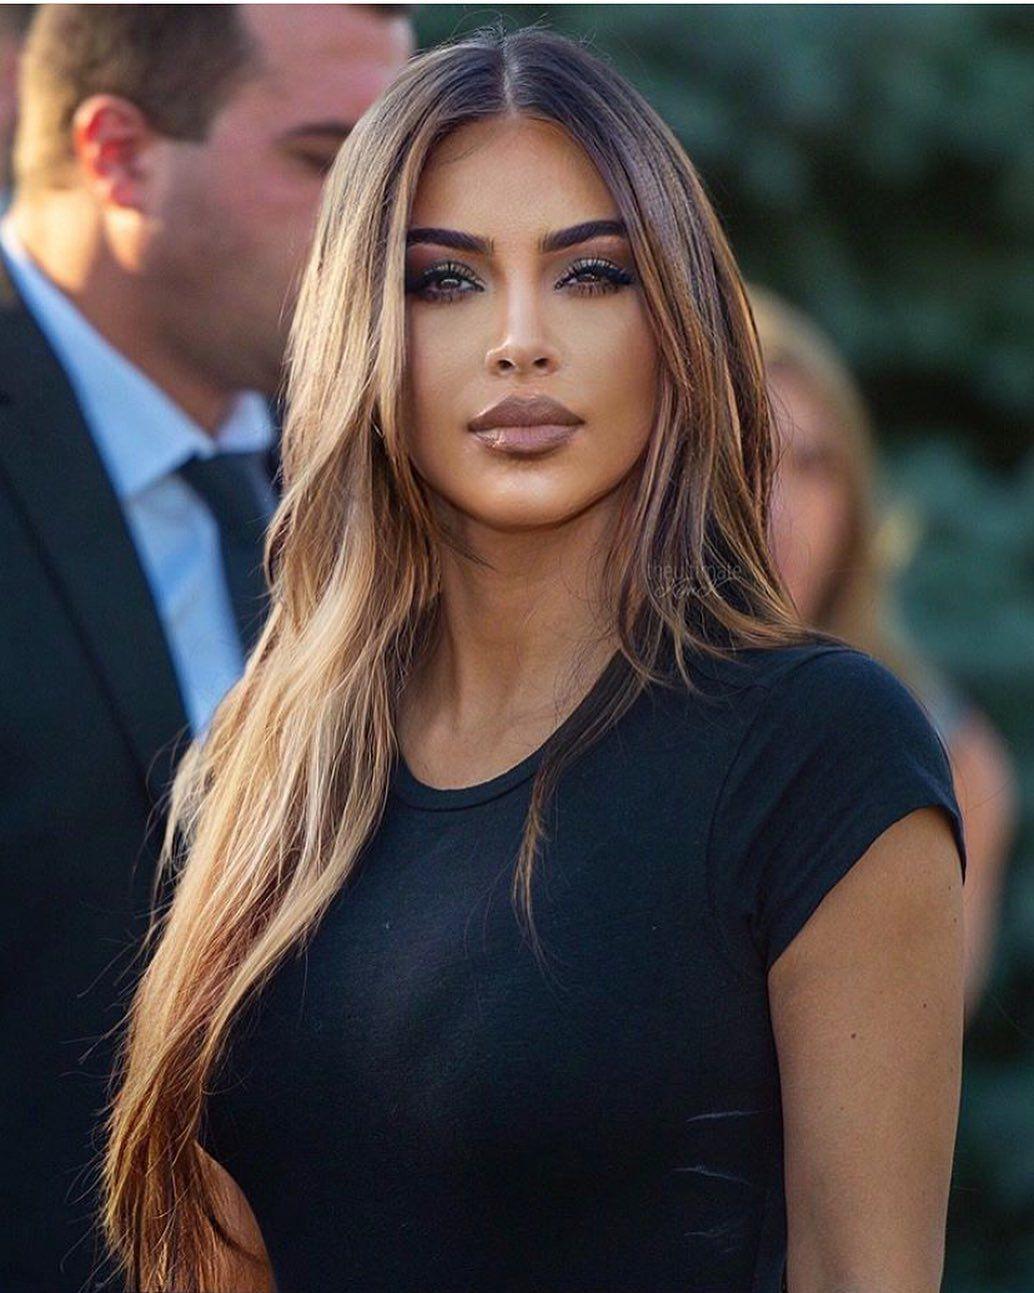 Kim Kardashian West On Instagram Kim With Light Brown Hair Kimkardashian Edit Theultimatekimk Hair Styles Long Hair Styles Kardashian Hair